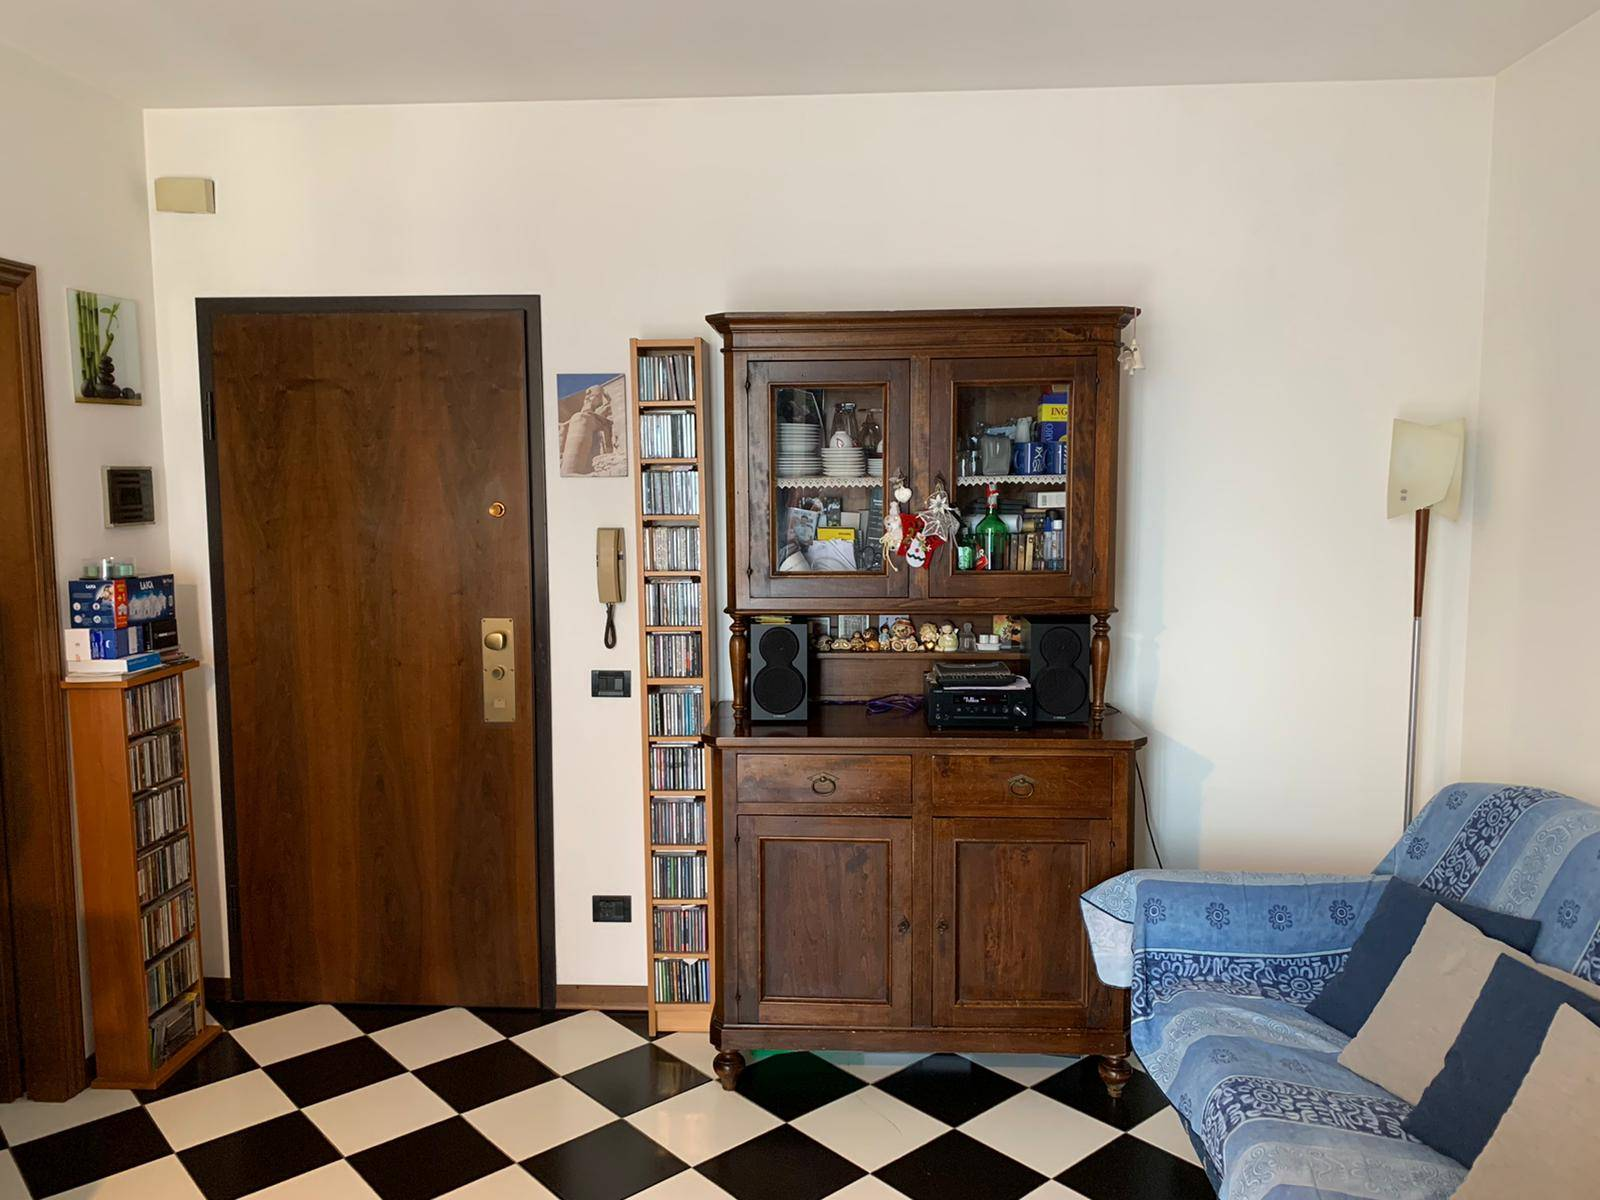 PARROCCHIA SAN BARTOLOMEO APOSTOLO IN SALZANO, SALZANO, Apartment for sale of 45 Sq. mt., Good condition, Heating Individual heating system,